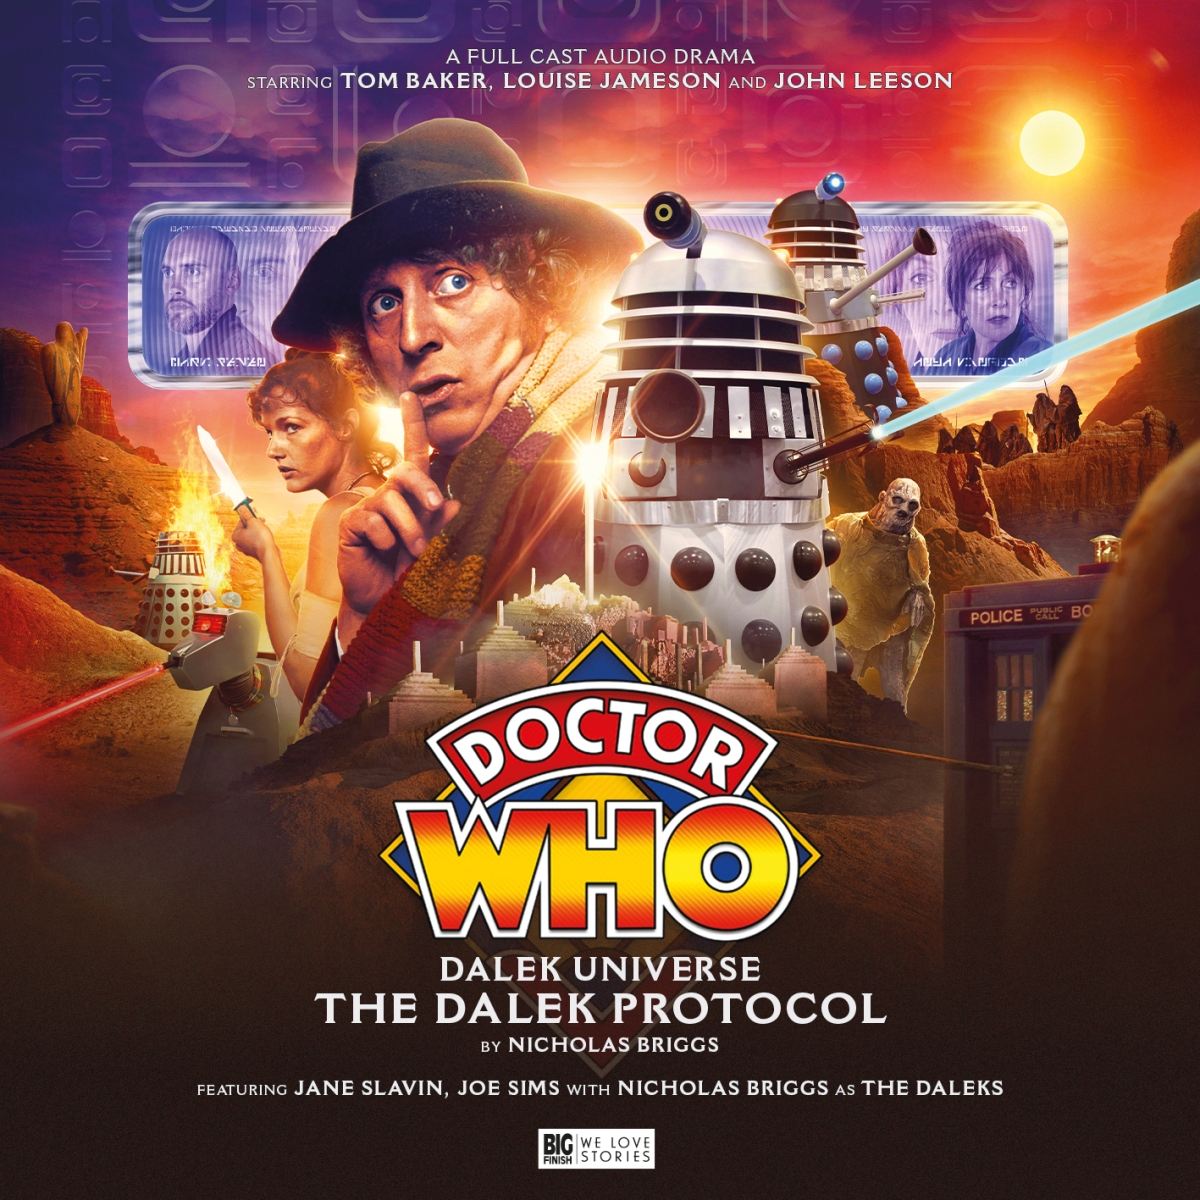 3rd Dr Who Jon Pertwee Prop Replica Owl Ring Cosplay Custom pas Tardis Dalek